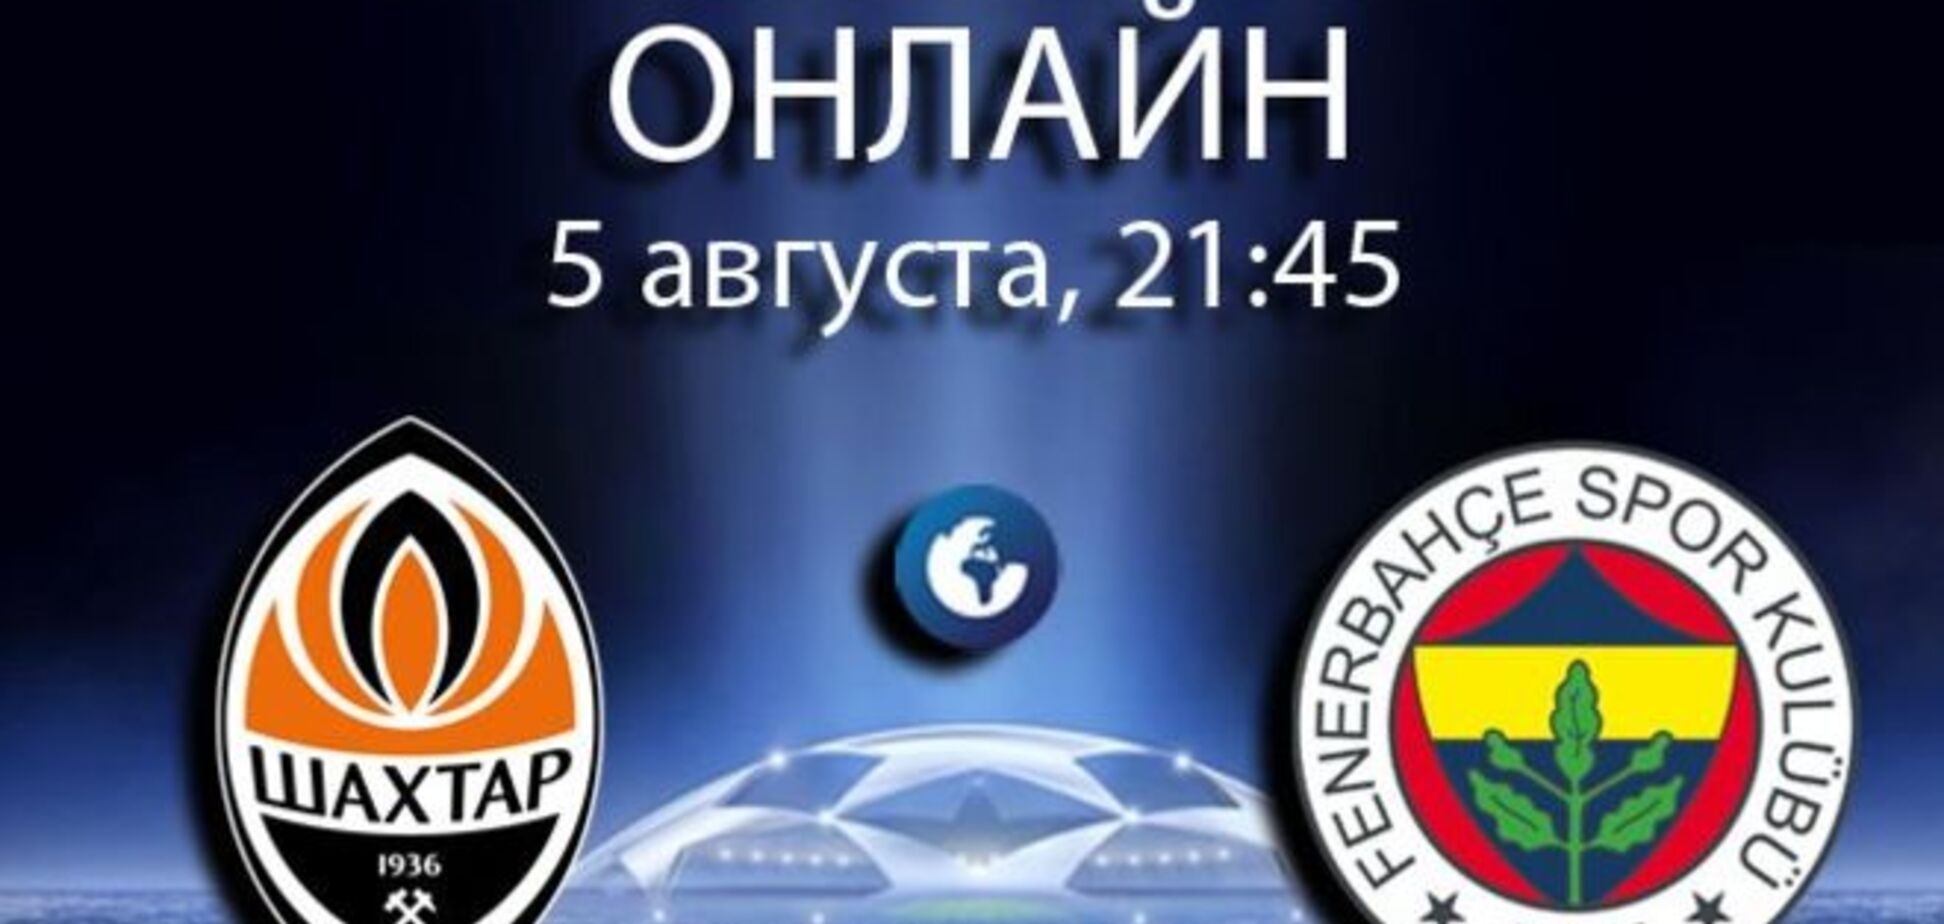 Шахтар - Фенербахче - 1-0: онлайн матчу